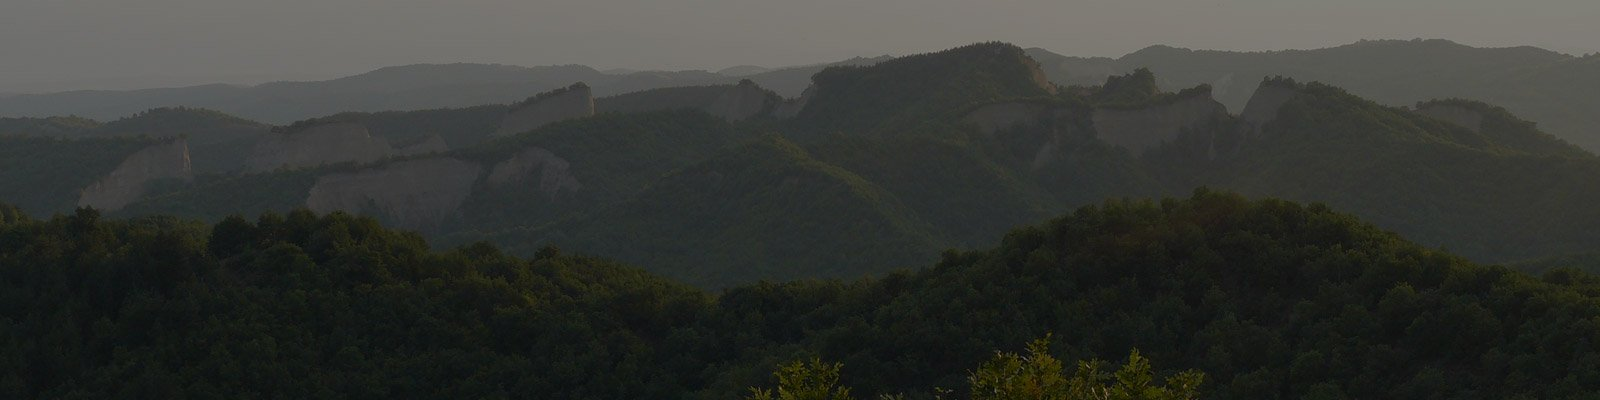 Explopedia Bułgaria Offroad